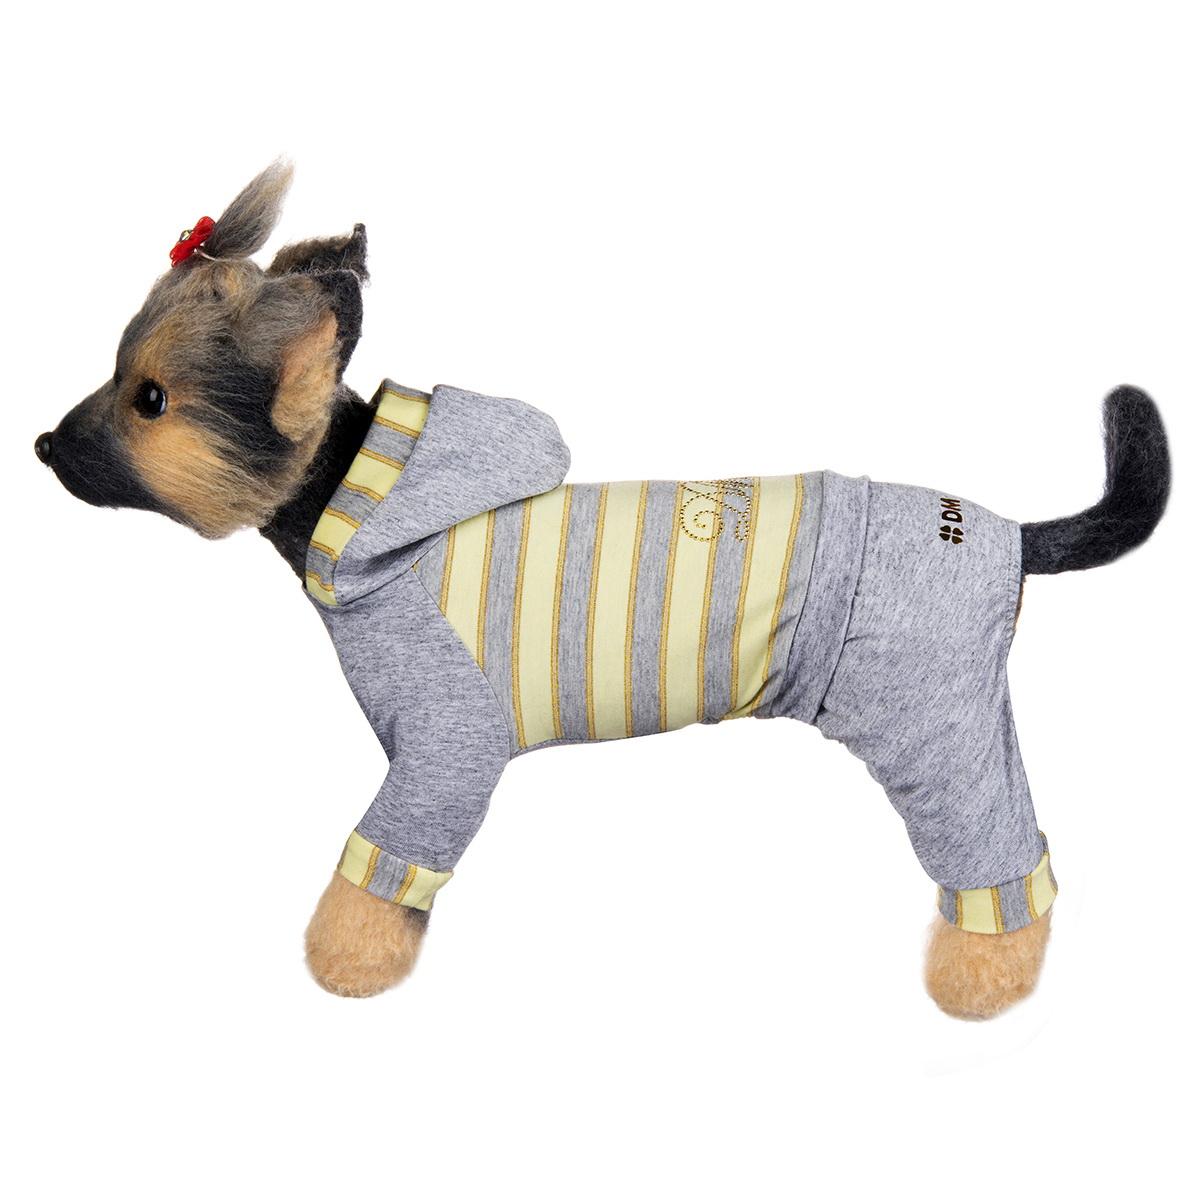 "Комбинезон для собак Dogmoda ""Грей"", унисекс, цвет: серый, желтый. Размер 4 (XL)"